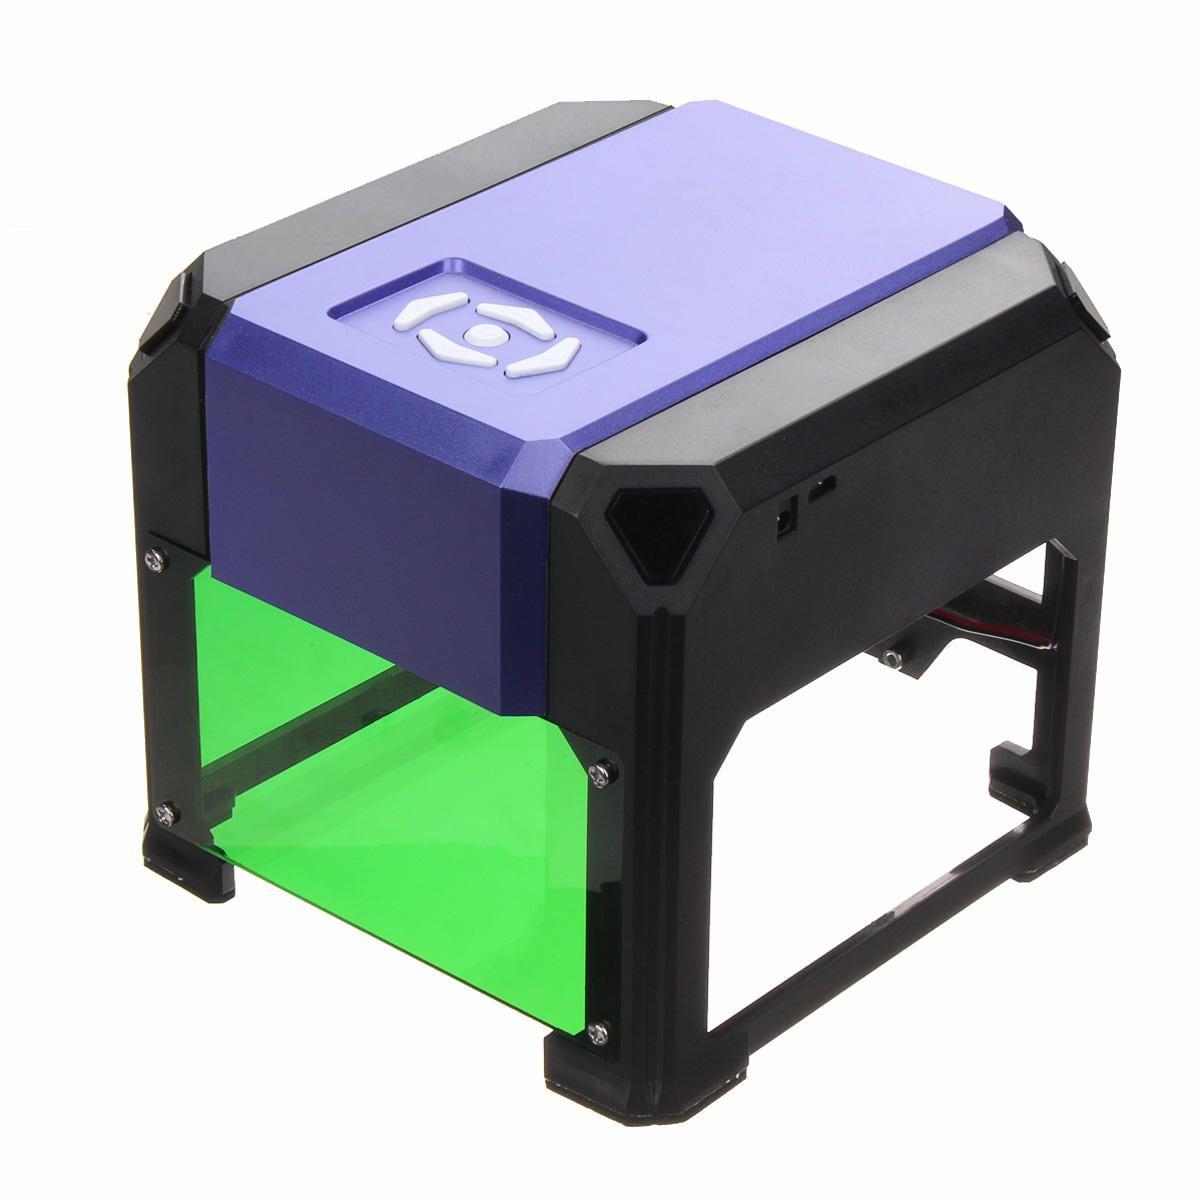 [US$109.90] K3 Purple 1500mW Mini Laser Engraver Printer DIY Logo Marking USB Engraving Machine 8x8cm #purple #1500mw #mini #laser #engraver #printer #logo #marking #engraving #machine #8x8cm